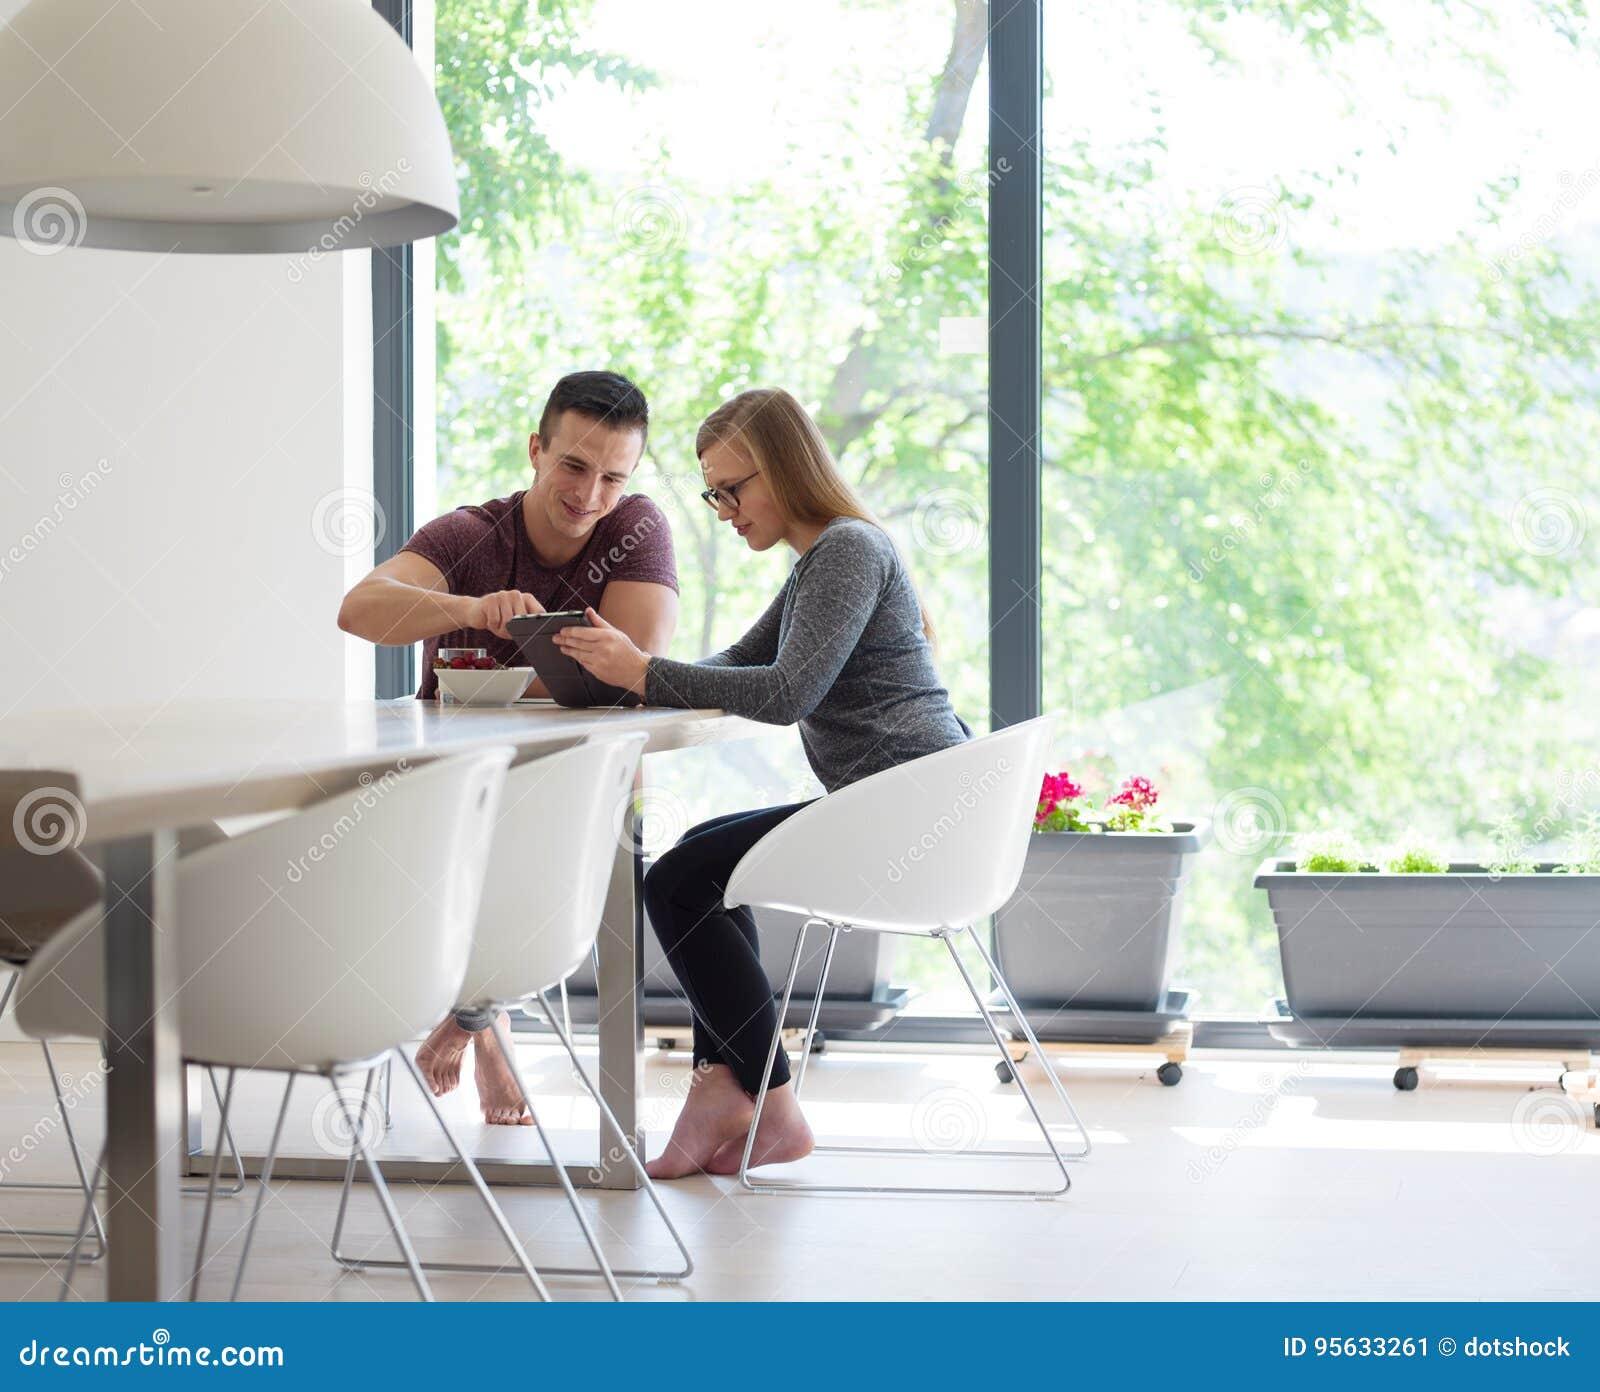 Couple Enjoying Their Summer Holidays Stock Photo: Couple Enjoying Morning Coffee And Strawberries Stock